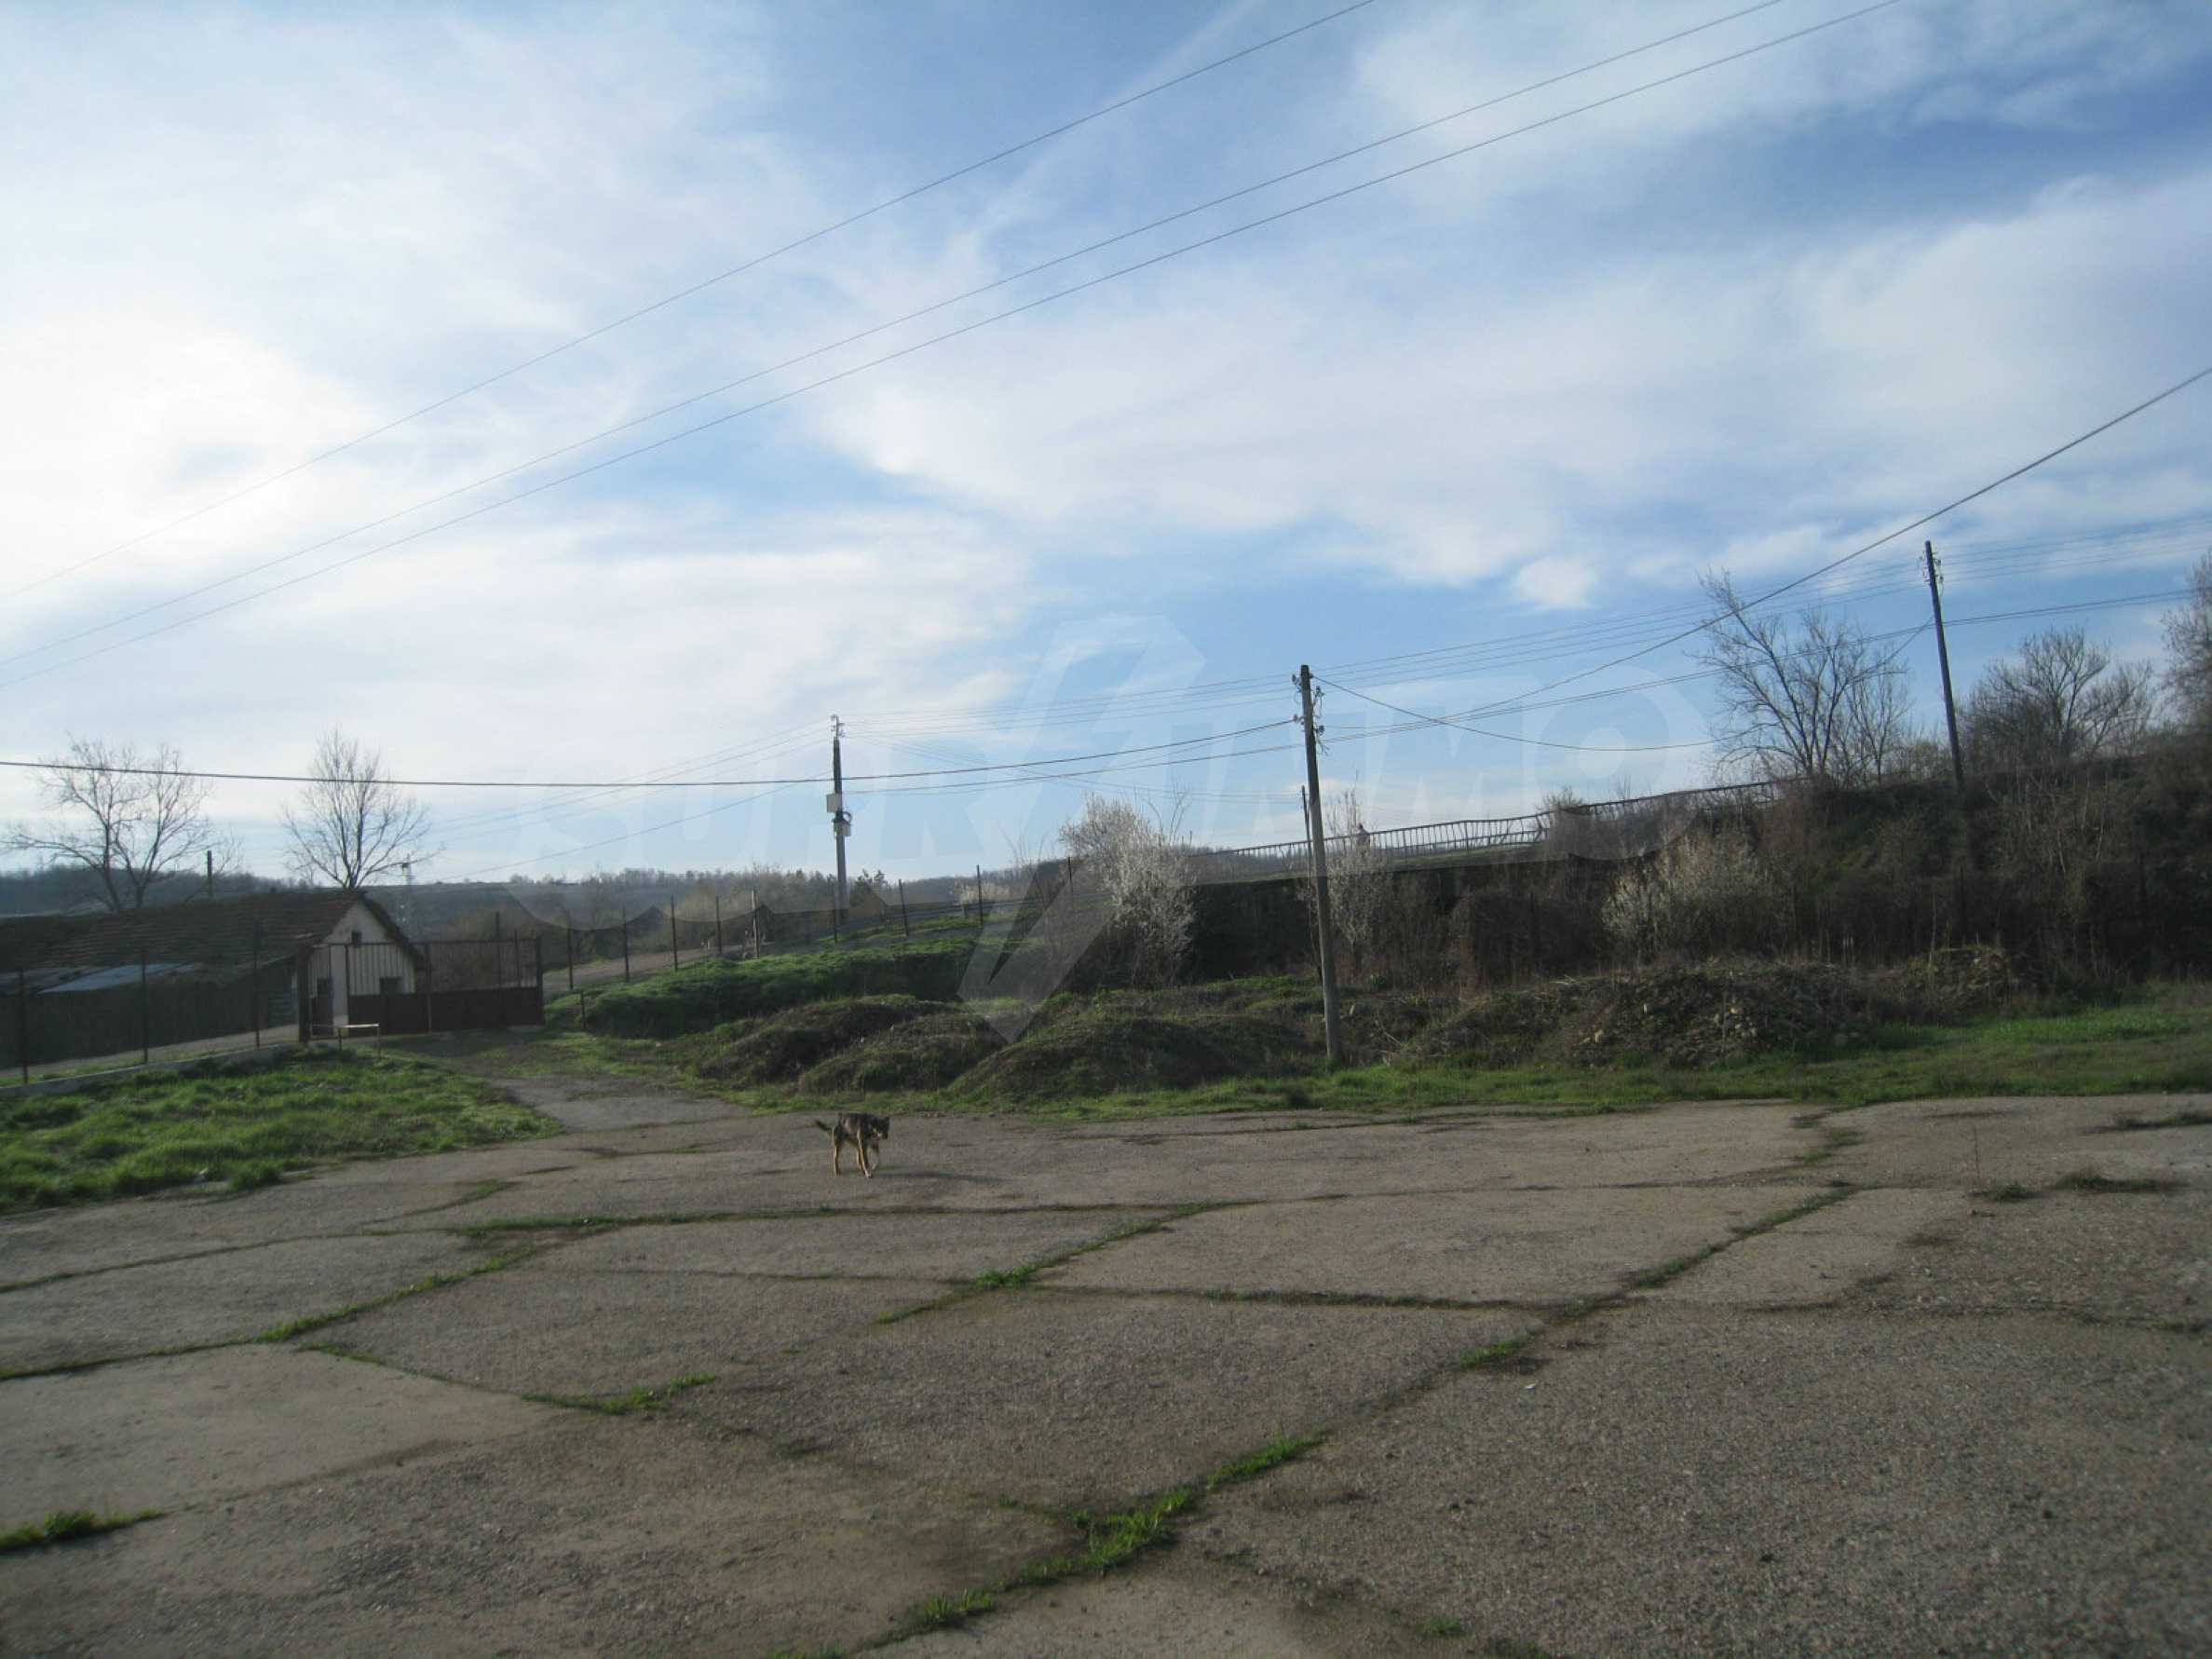 Fishpond, warehouses, residential areas and asphalt ground near Montana 37